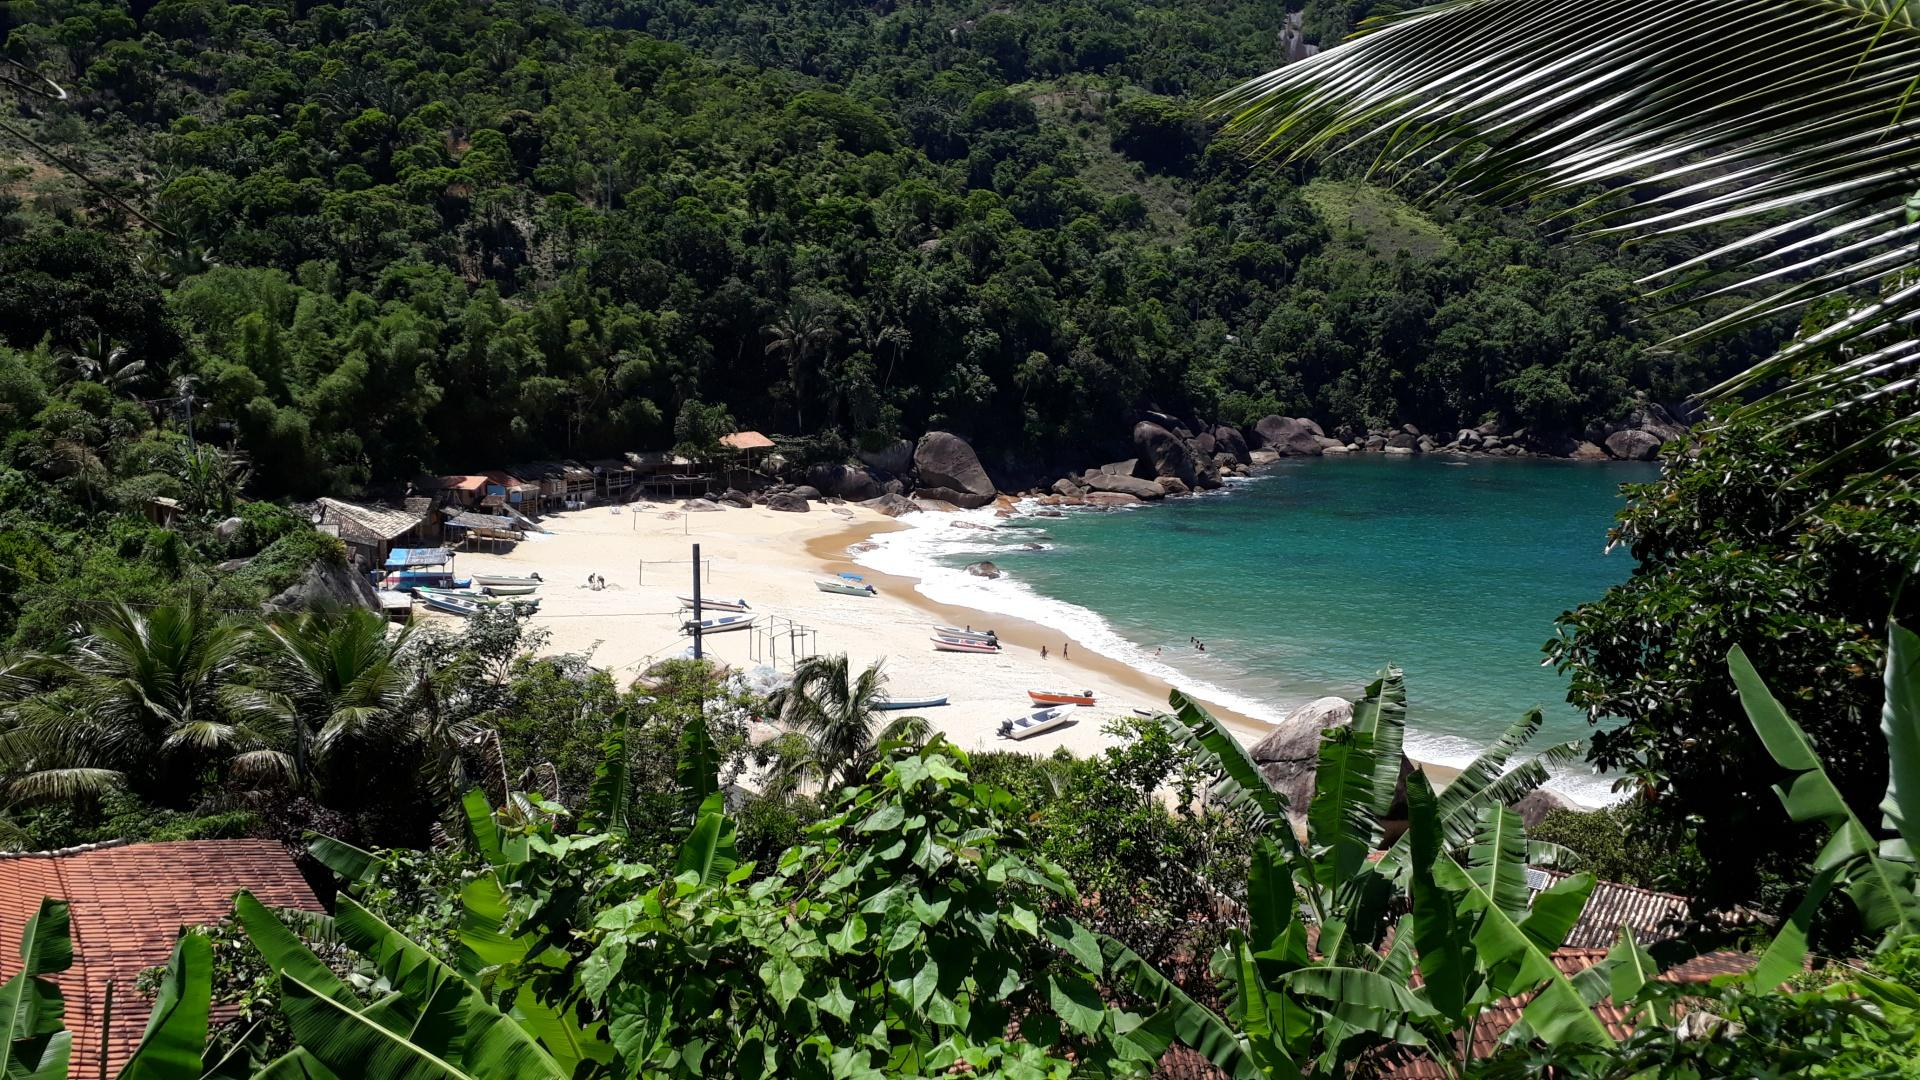 2 Tage Trekking Tour zum Wasserfall Saco Bravo bei Paraty